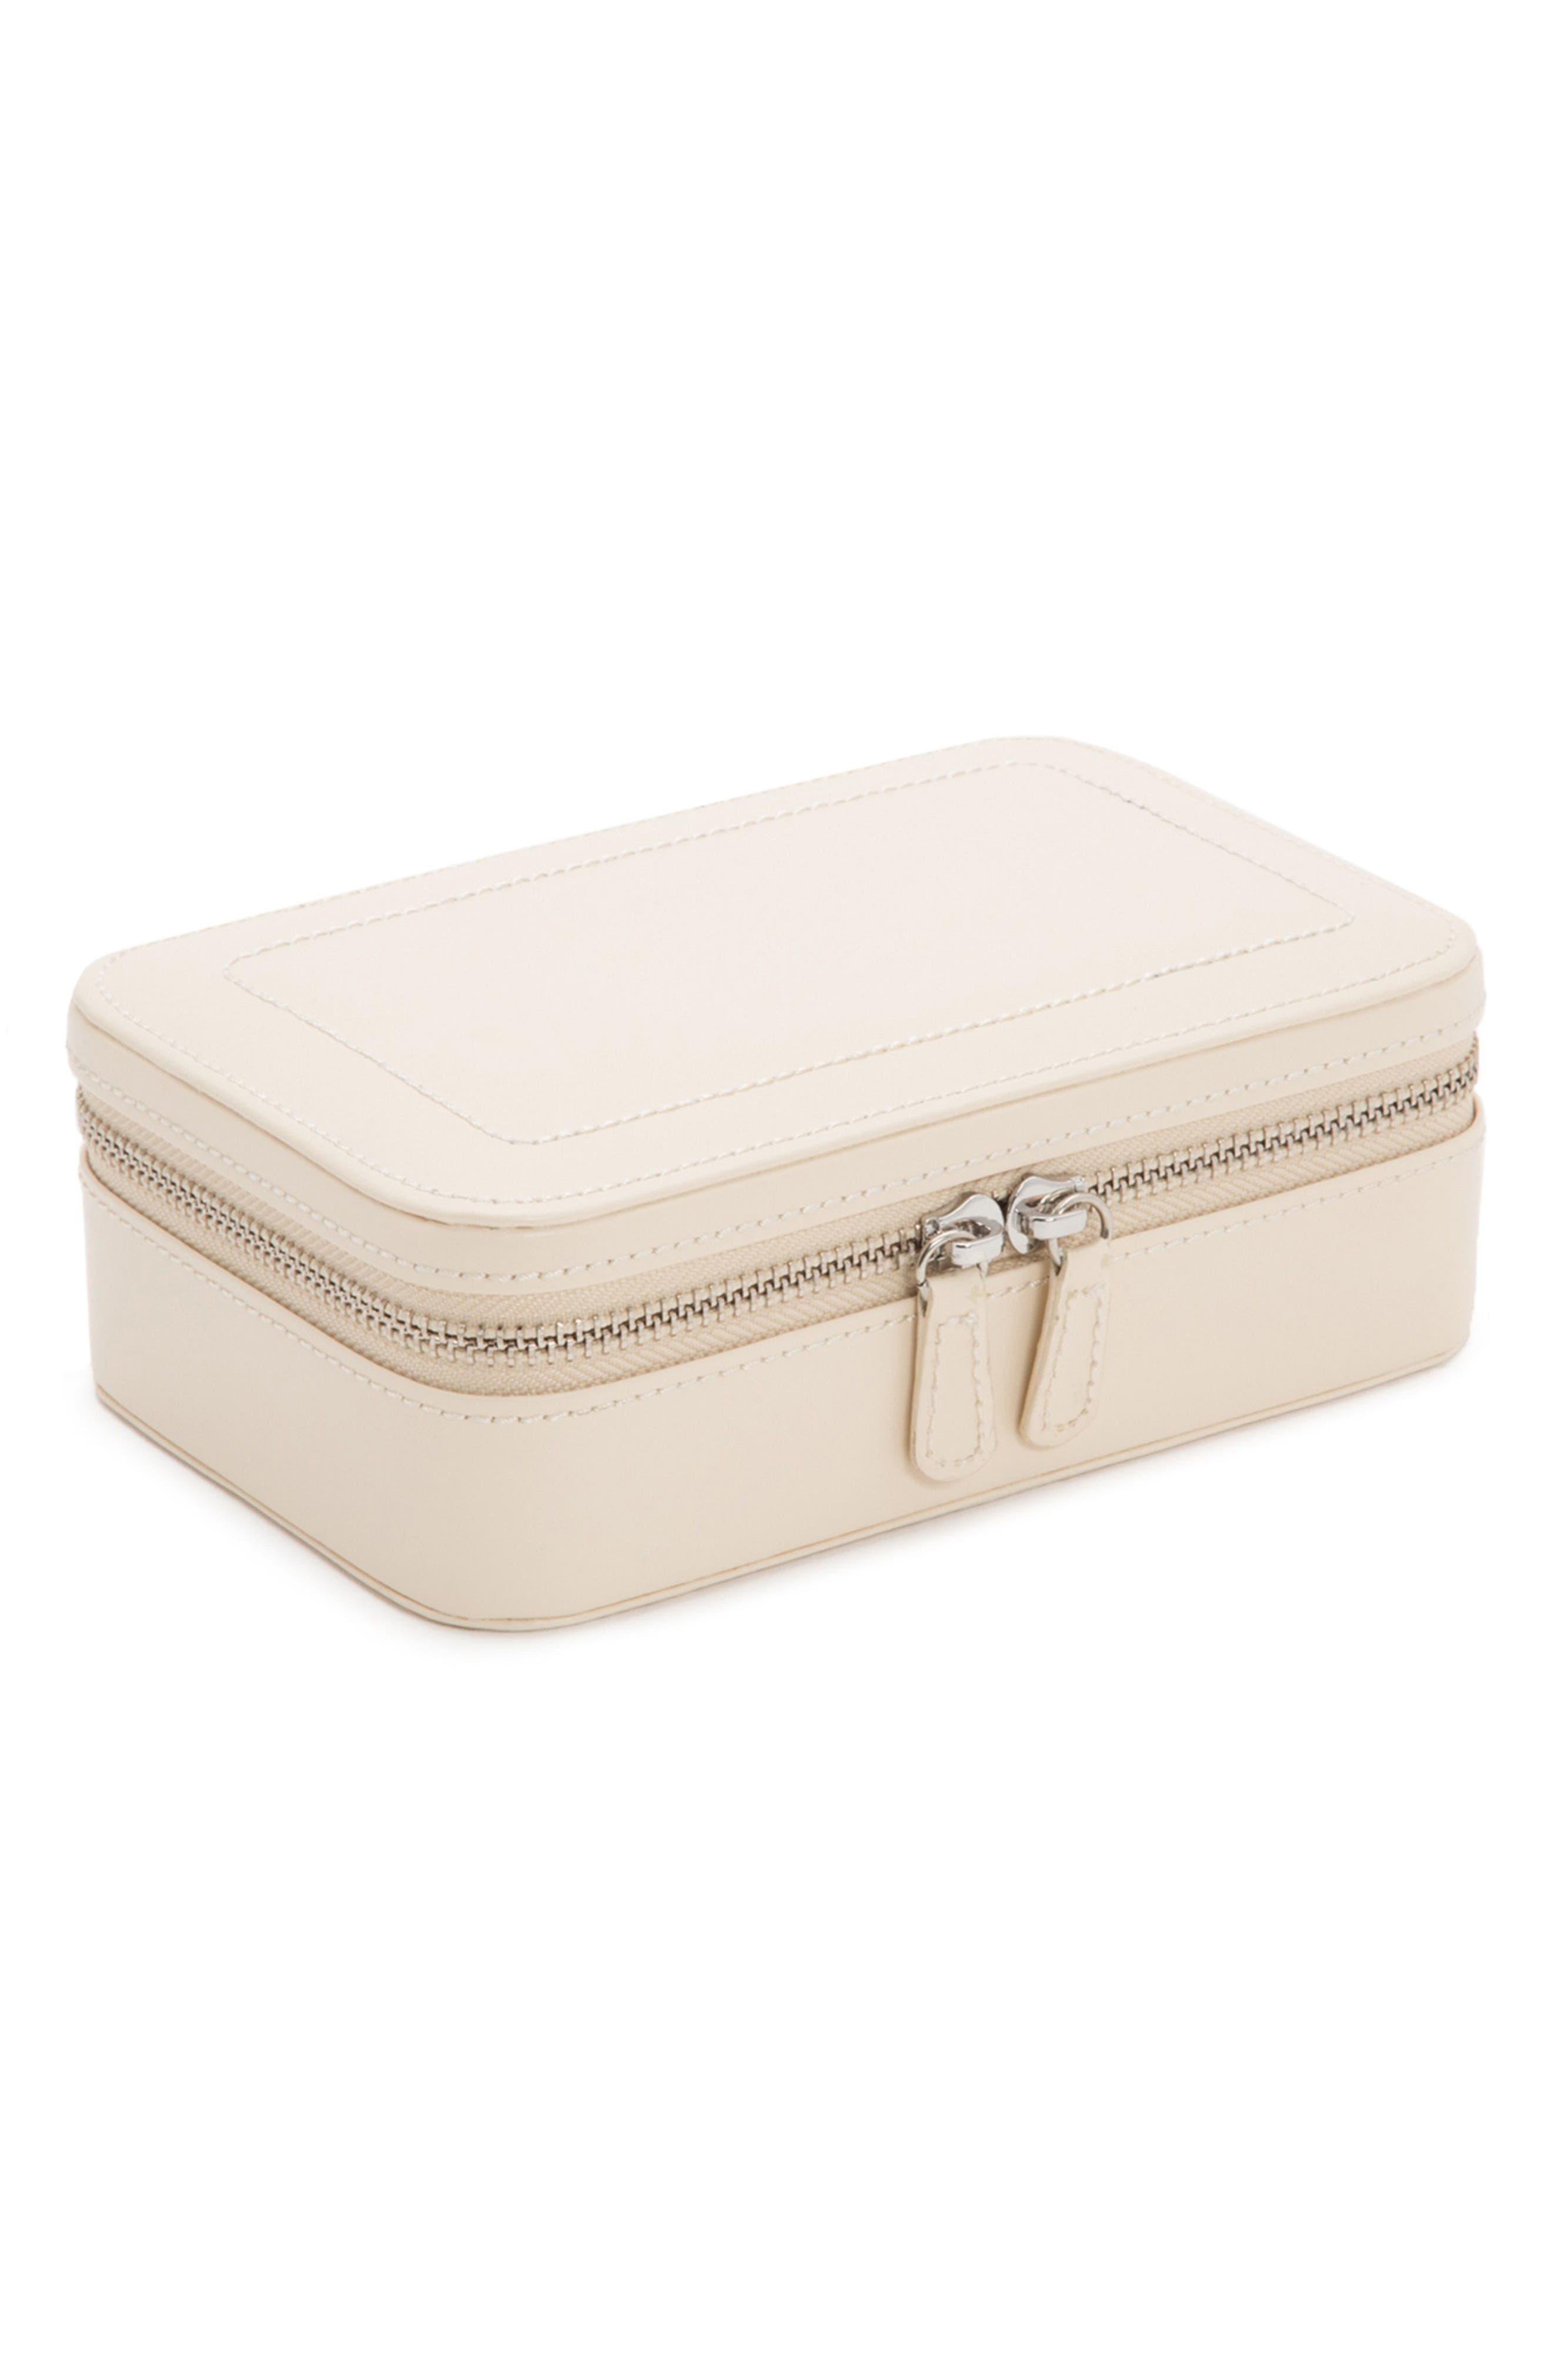 Sophia Rectangle Zip Case,                         Main,                         color, Ivory